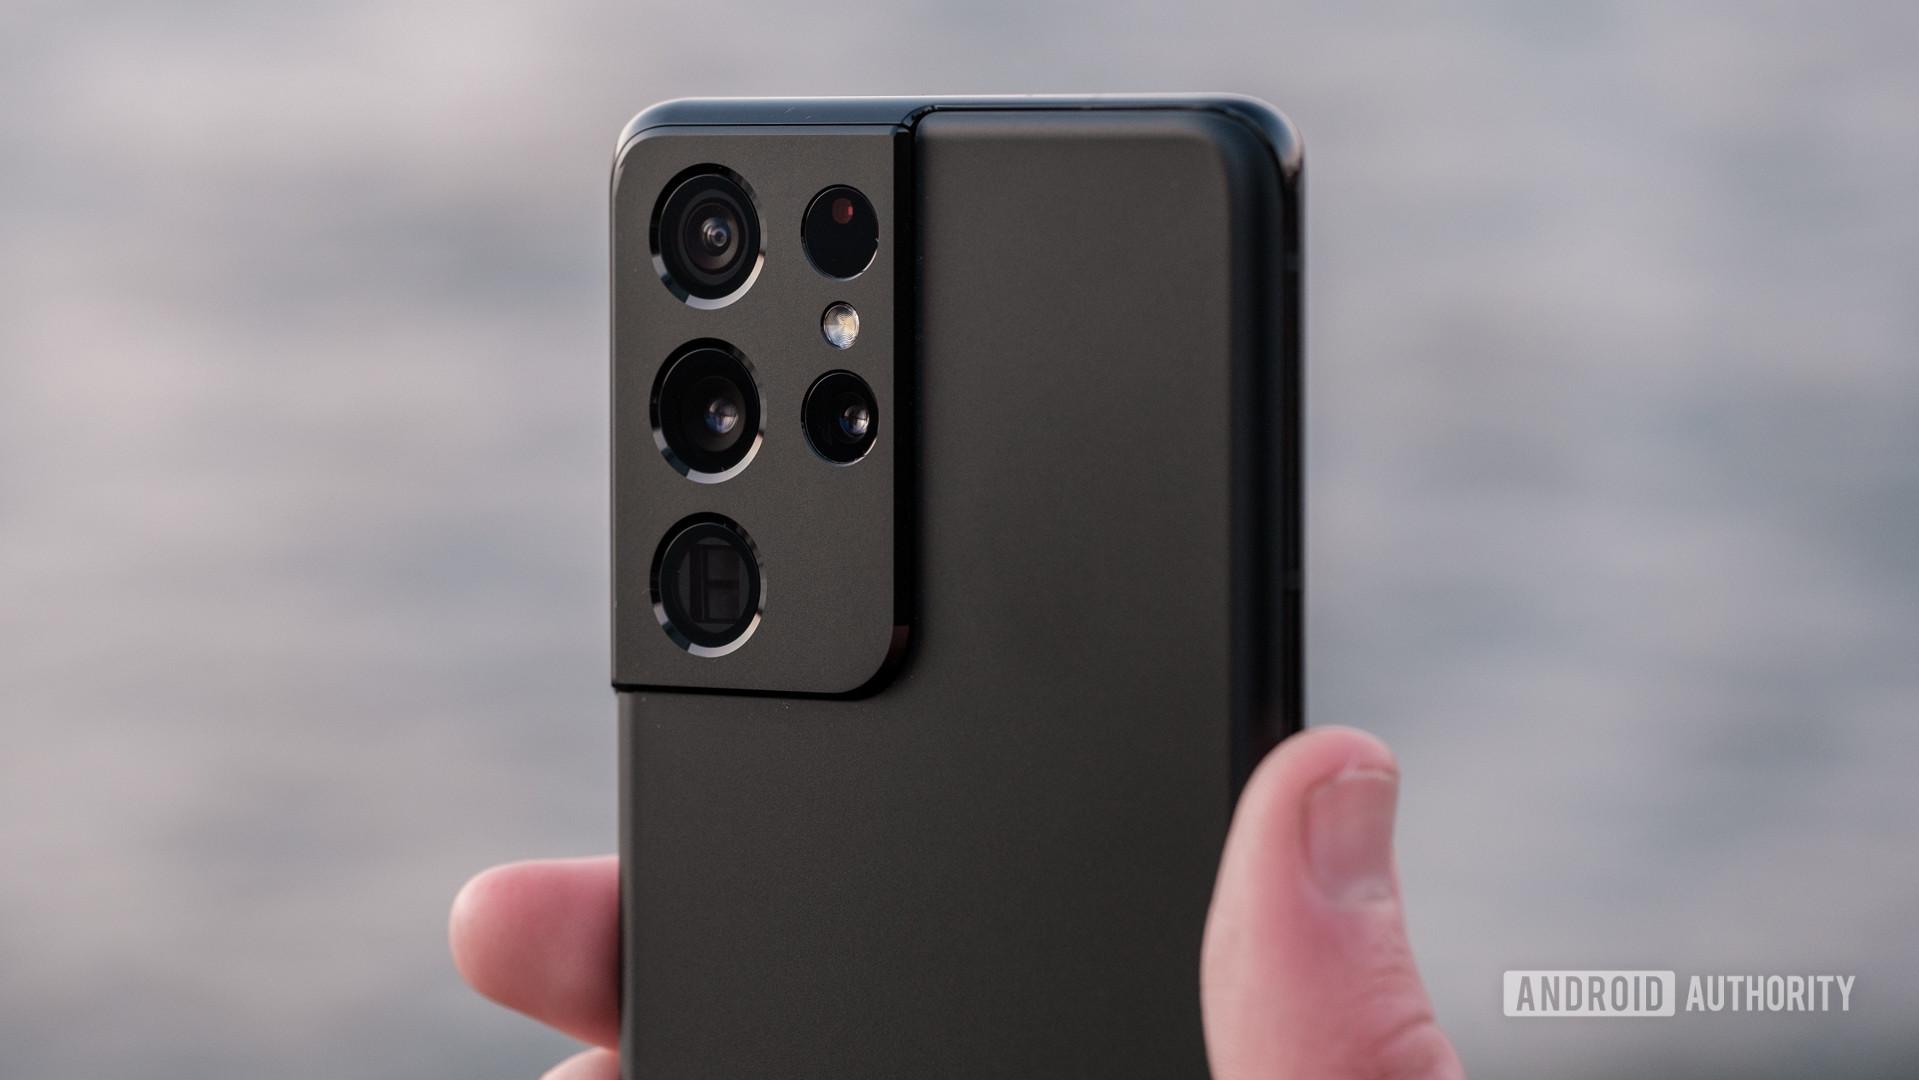 Samsung Galaxy S21 Ultra camera module macro in hand